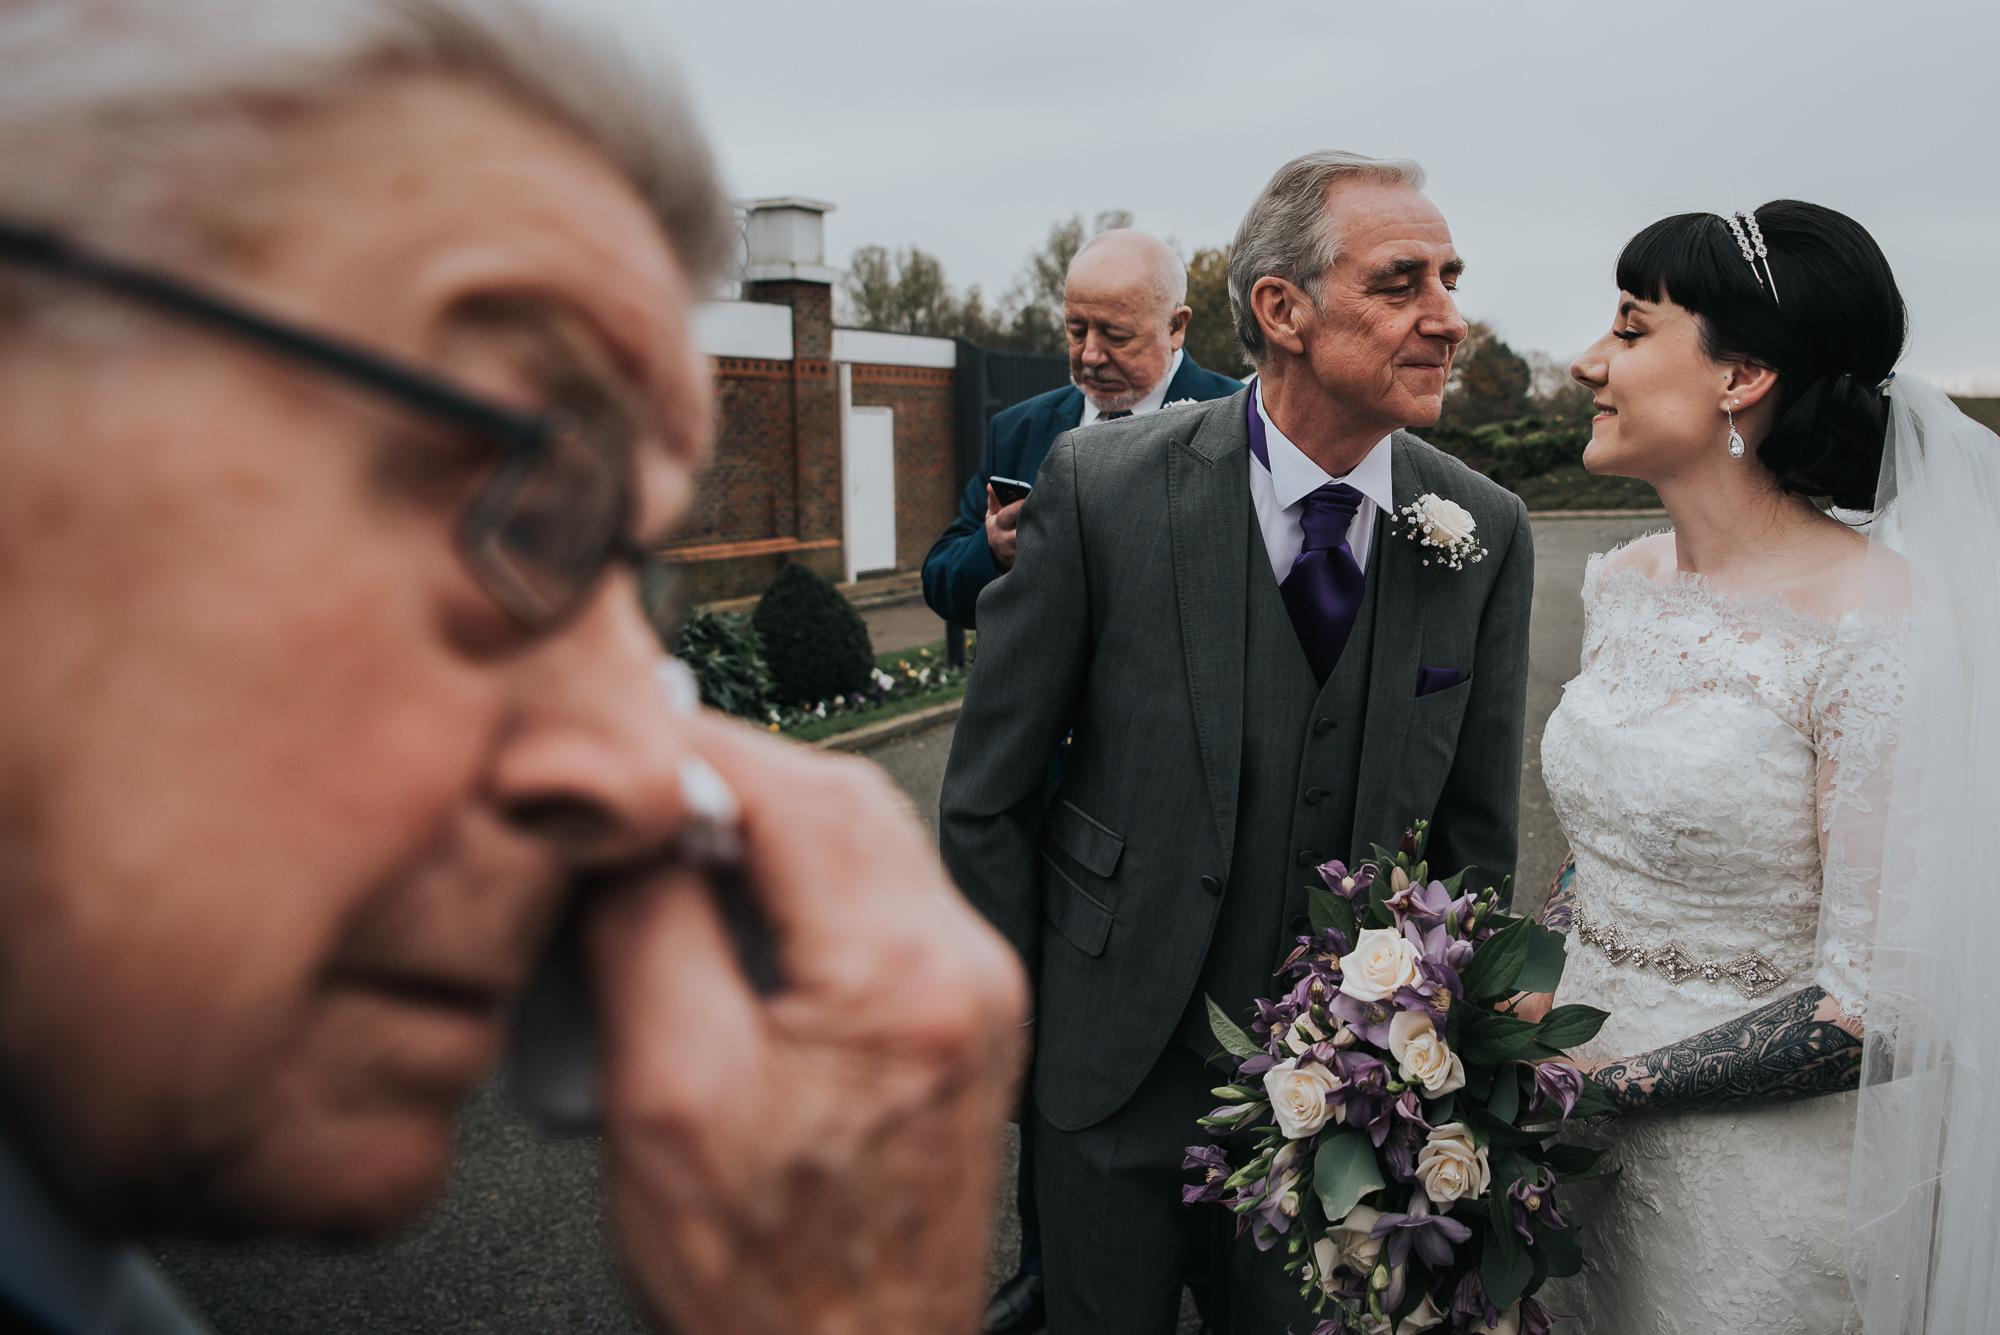 Owen HOuse Wedding Barn WEdding Photographer cheshire adam joe roberts photography (1 of 1).jpg